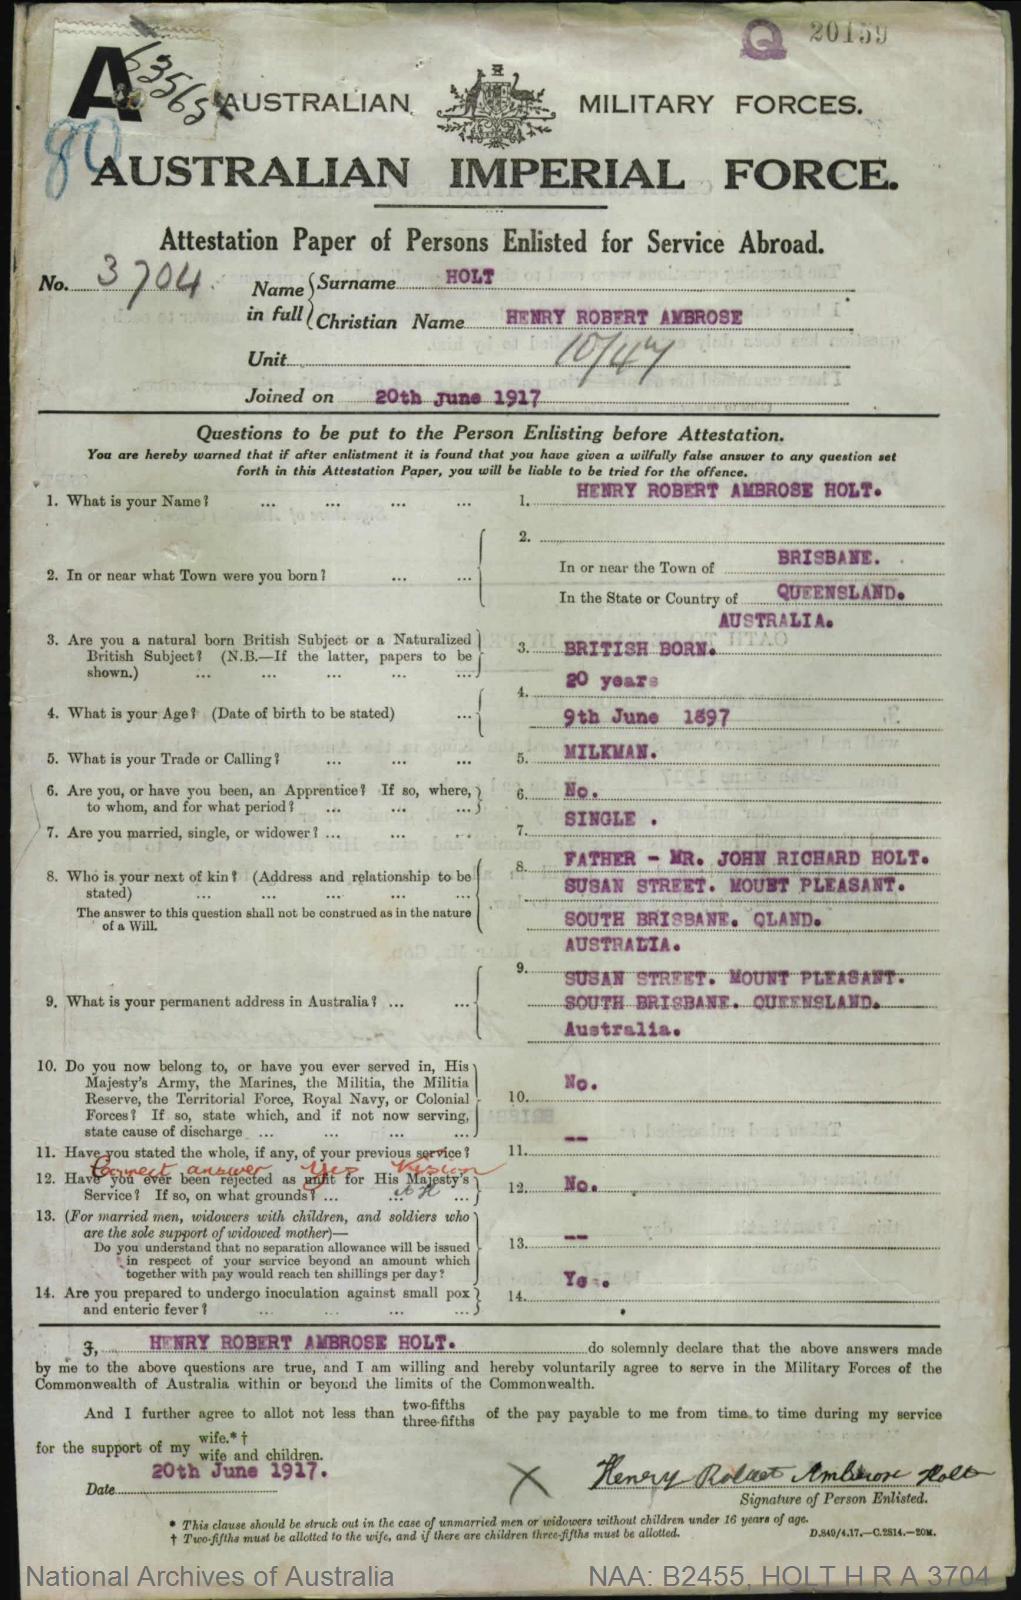 HOLT Henry Robert Ambrose : Service Number - 3704 : Place of Birth - Brisbane Qld : Place of Enlistment - Brisbane Qld : Next of Kin - (Father) HOLT John Richard